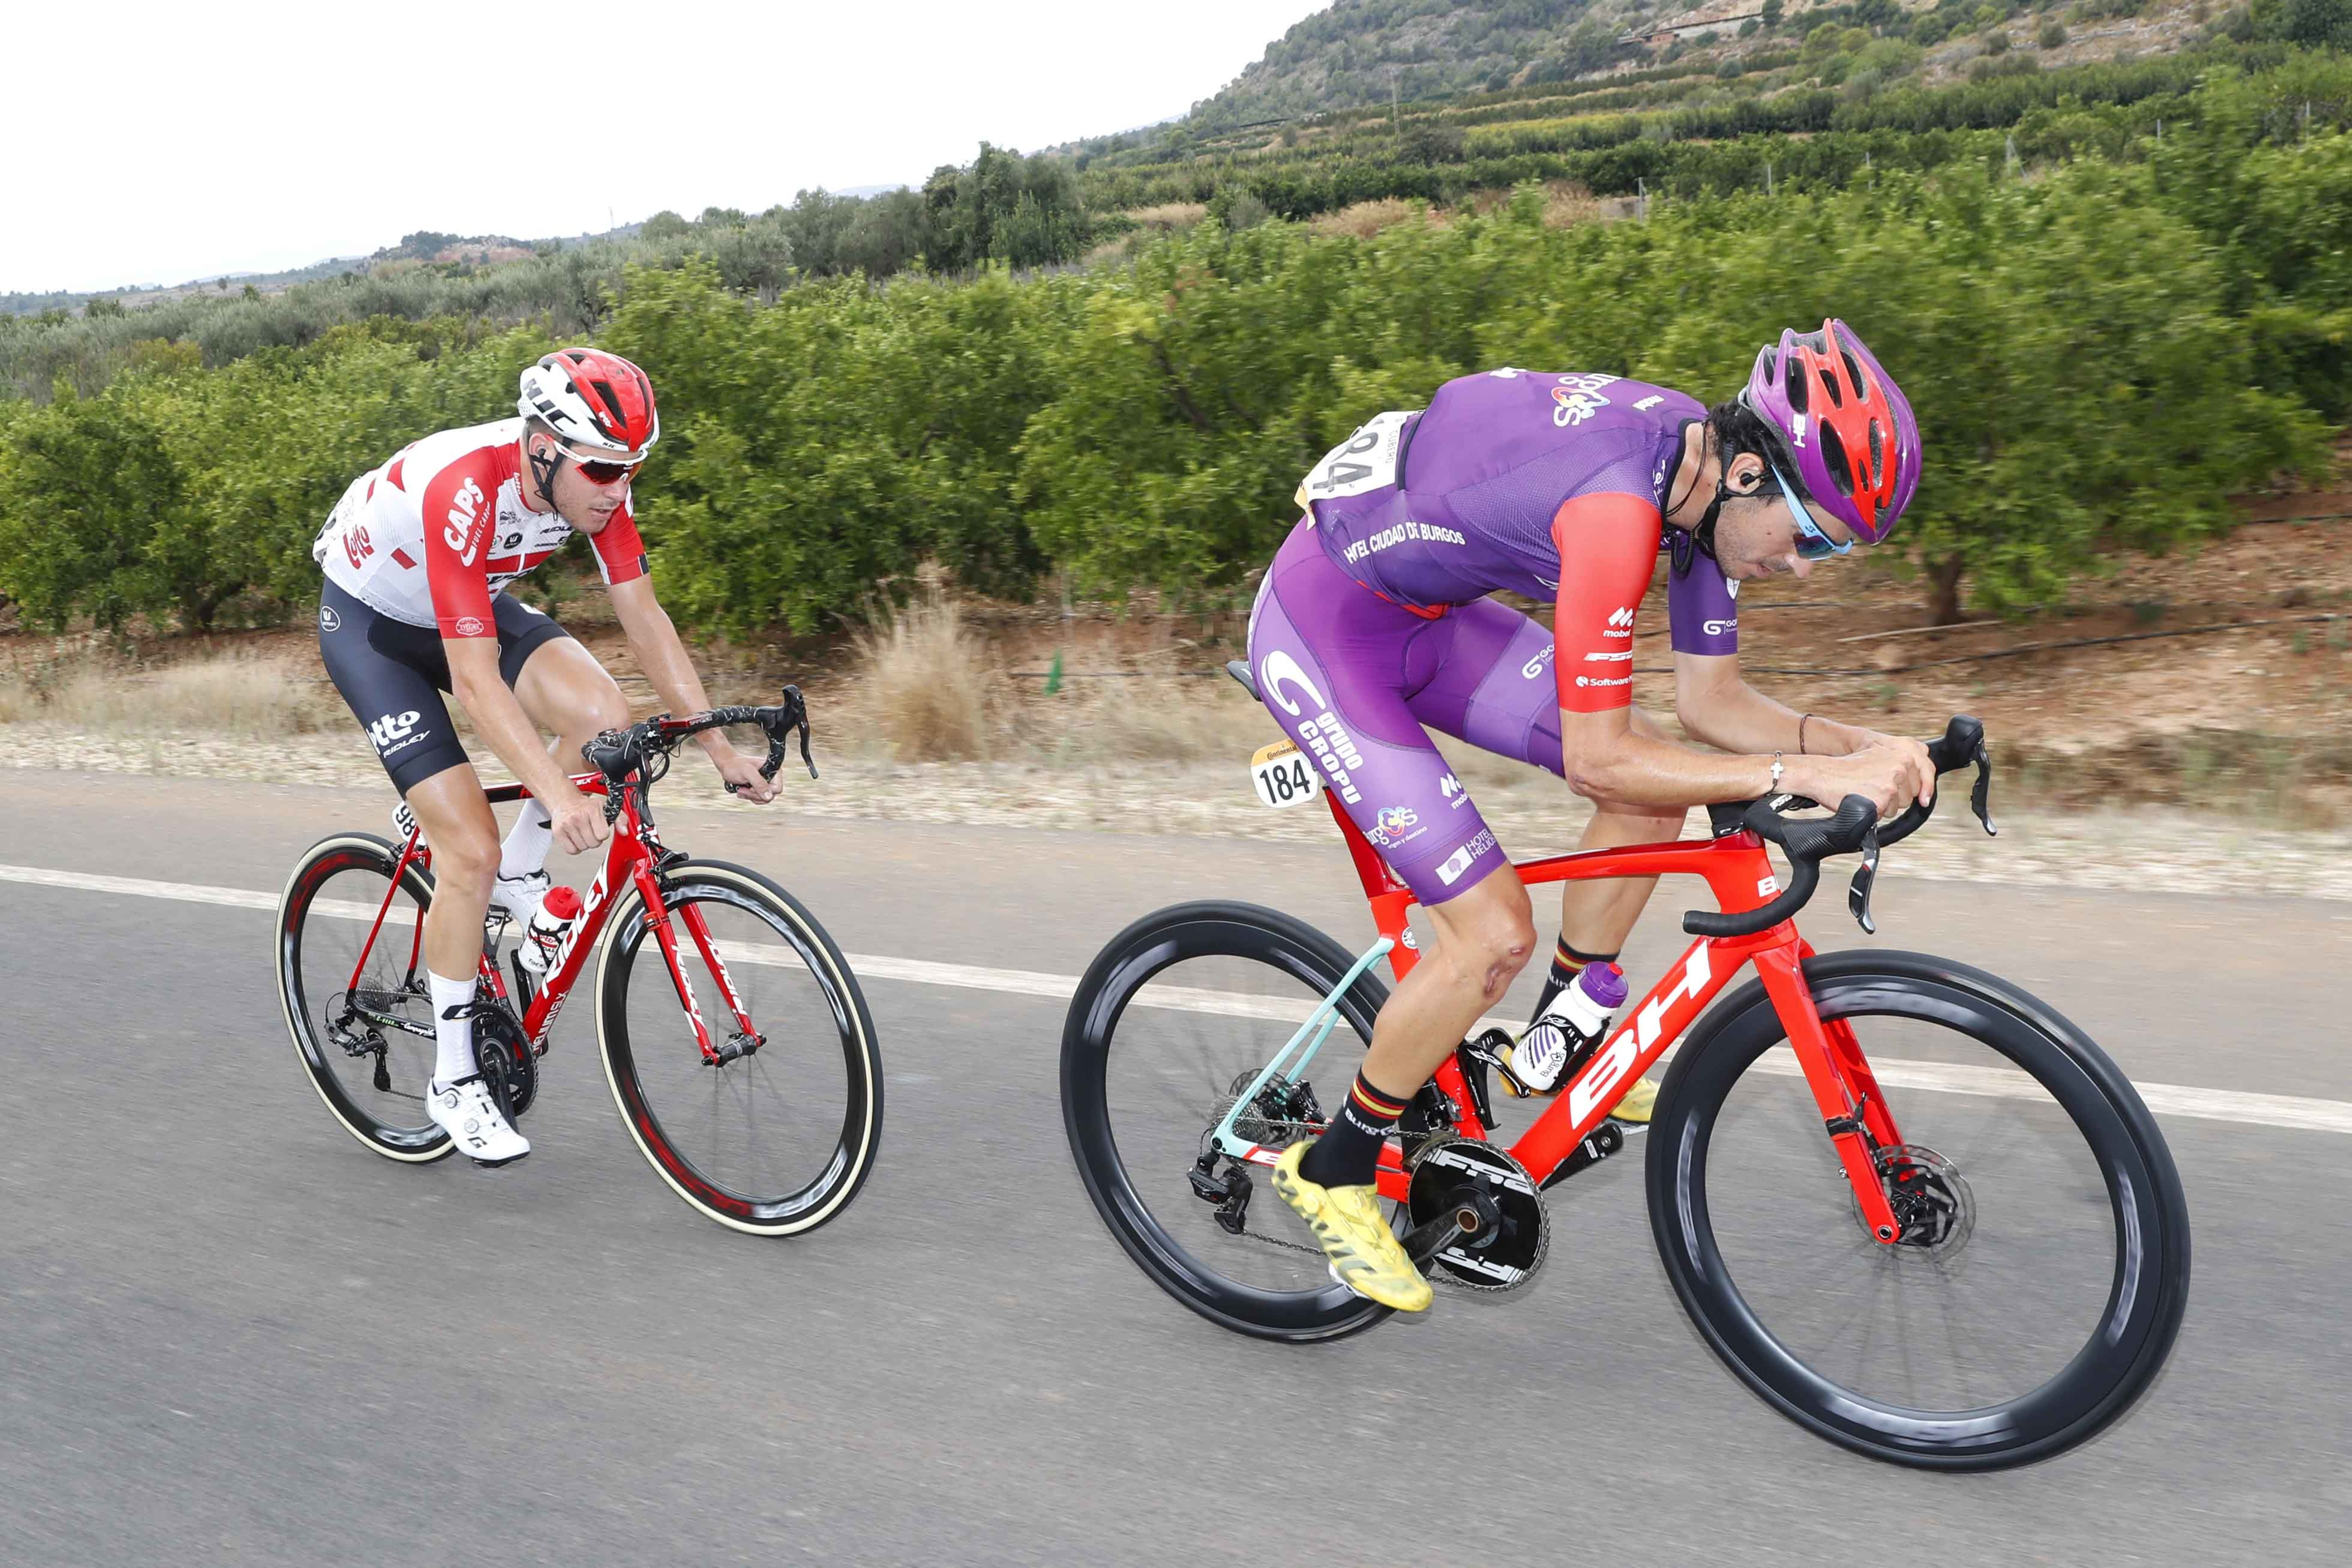 Jorge Cubero La Vuelta Burgos BH